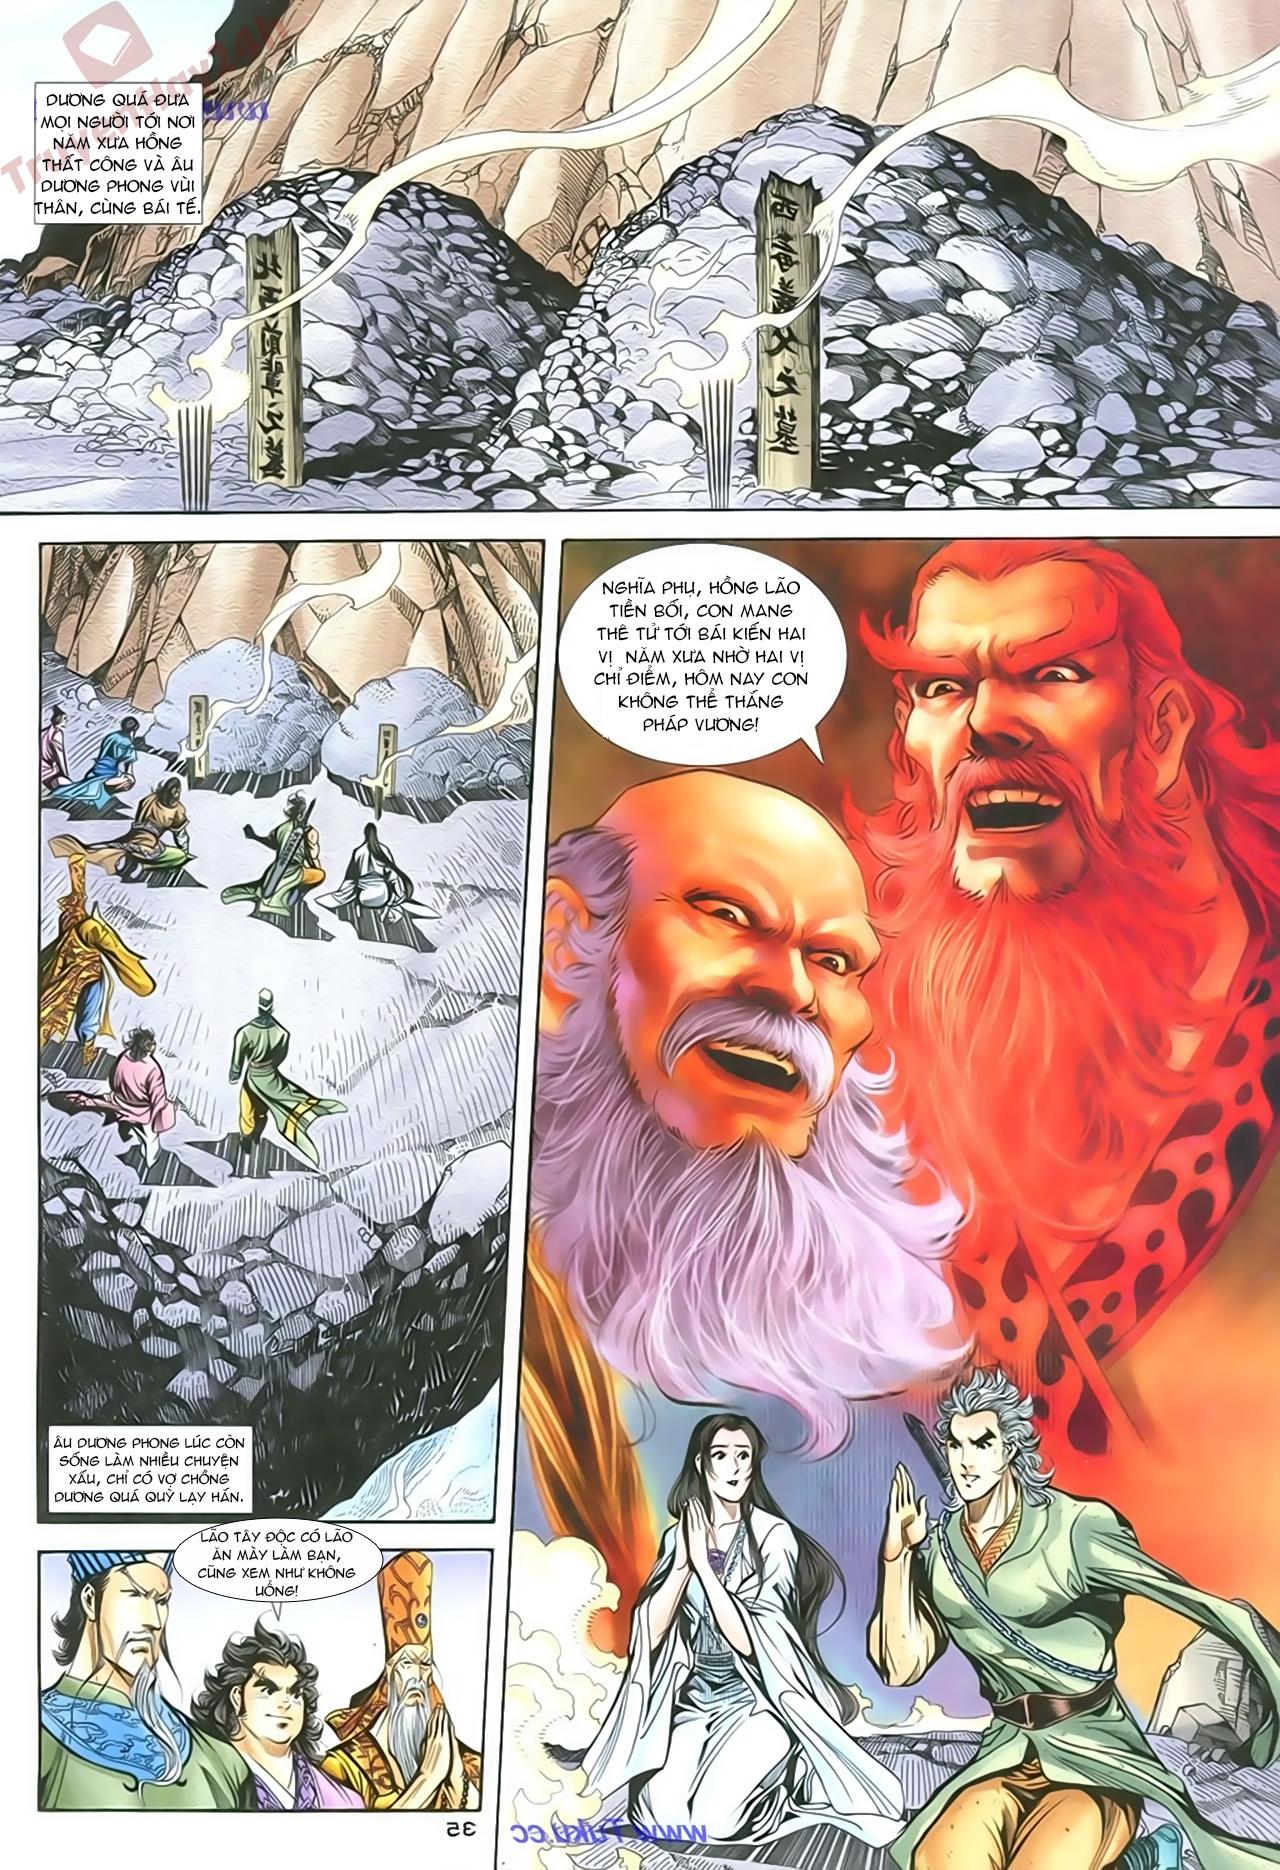 Thần Điêu Hiệp Lữ chap 86 – End Trang 34 - Mangak.info